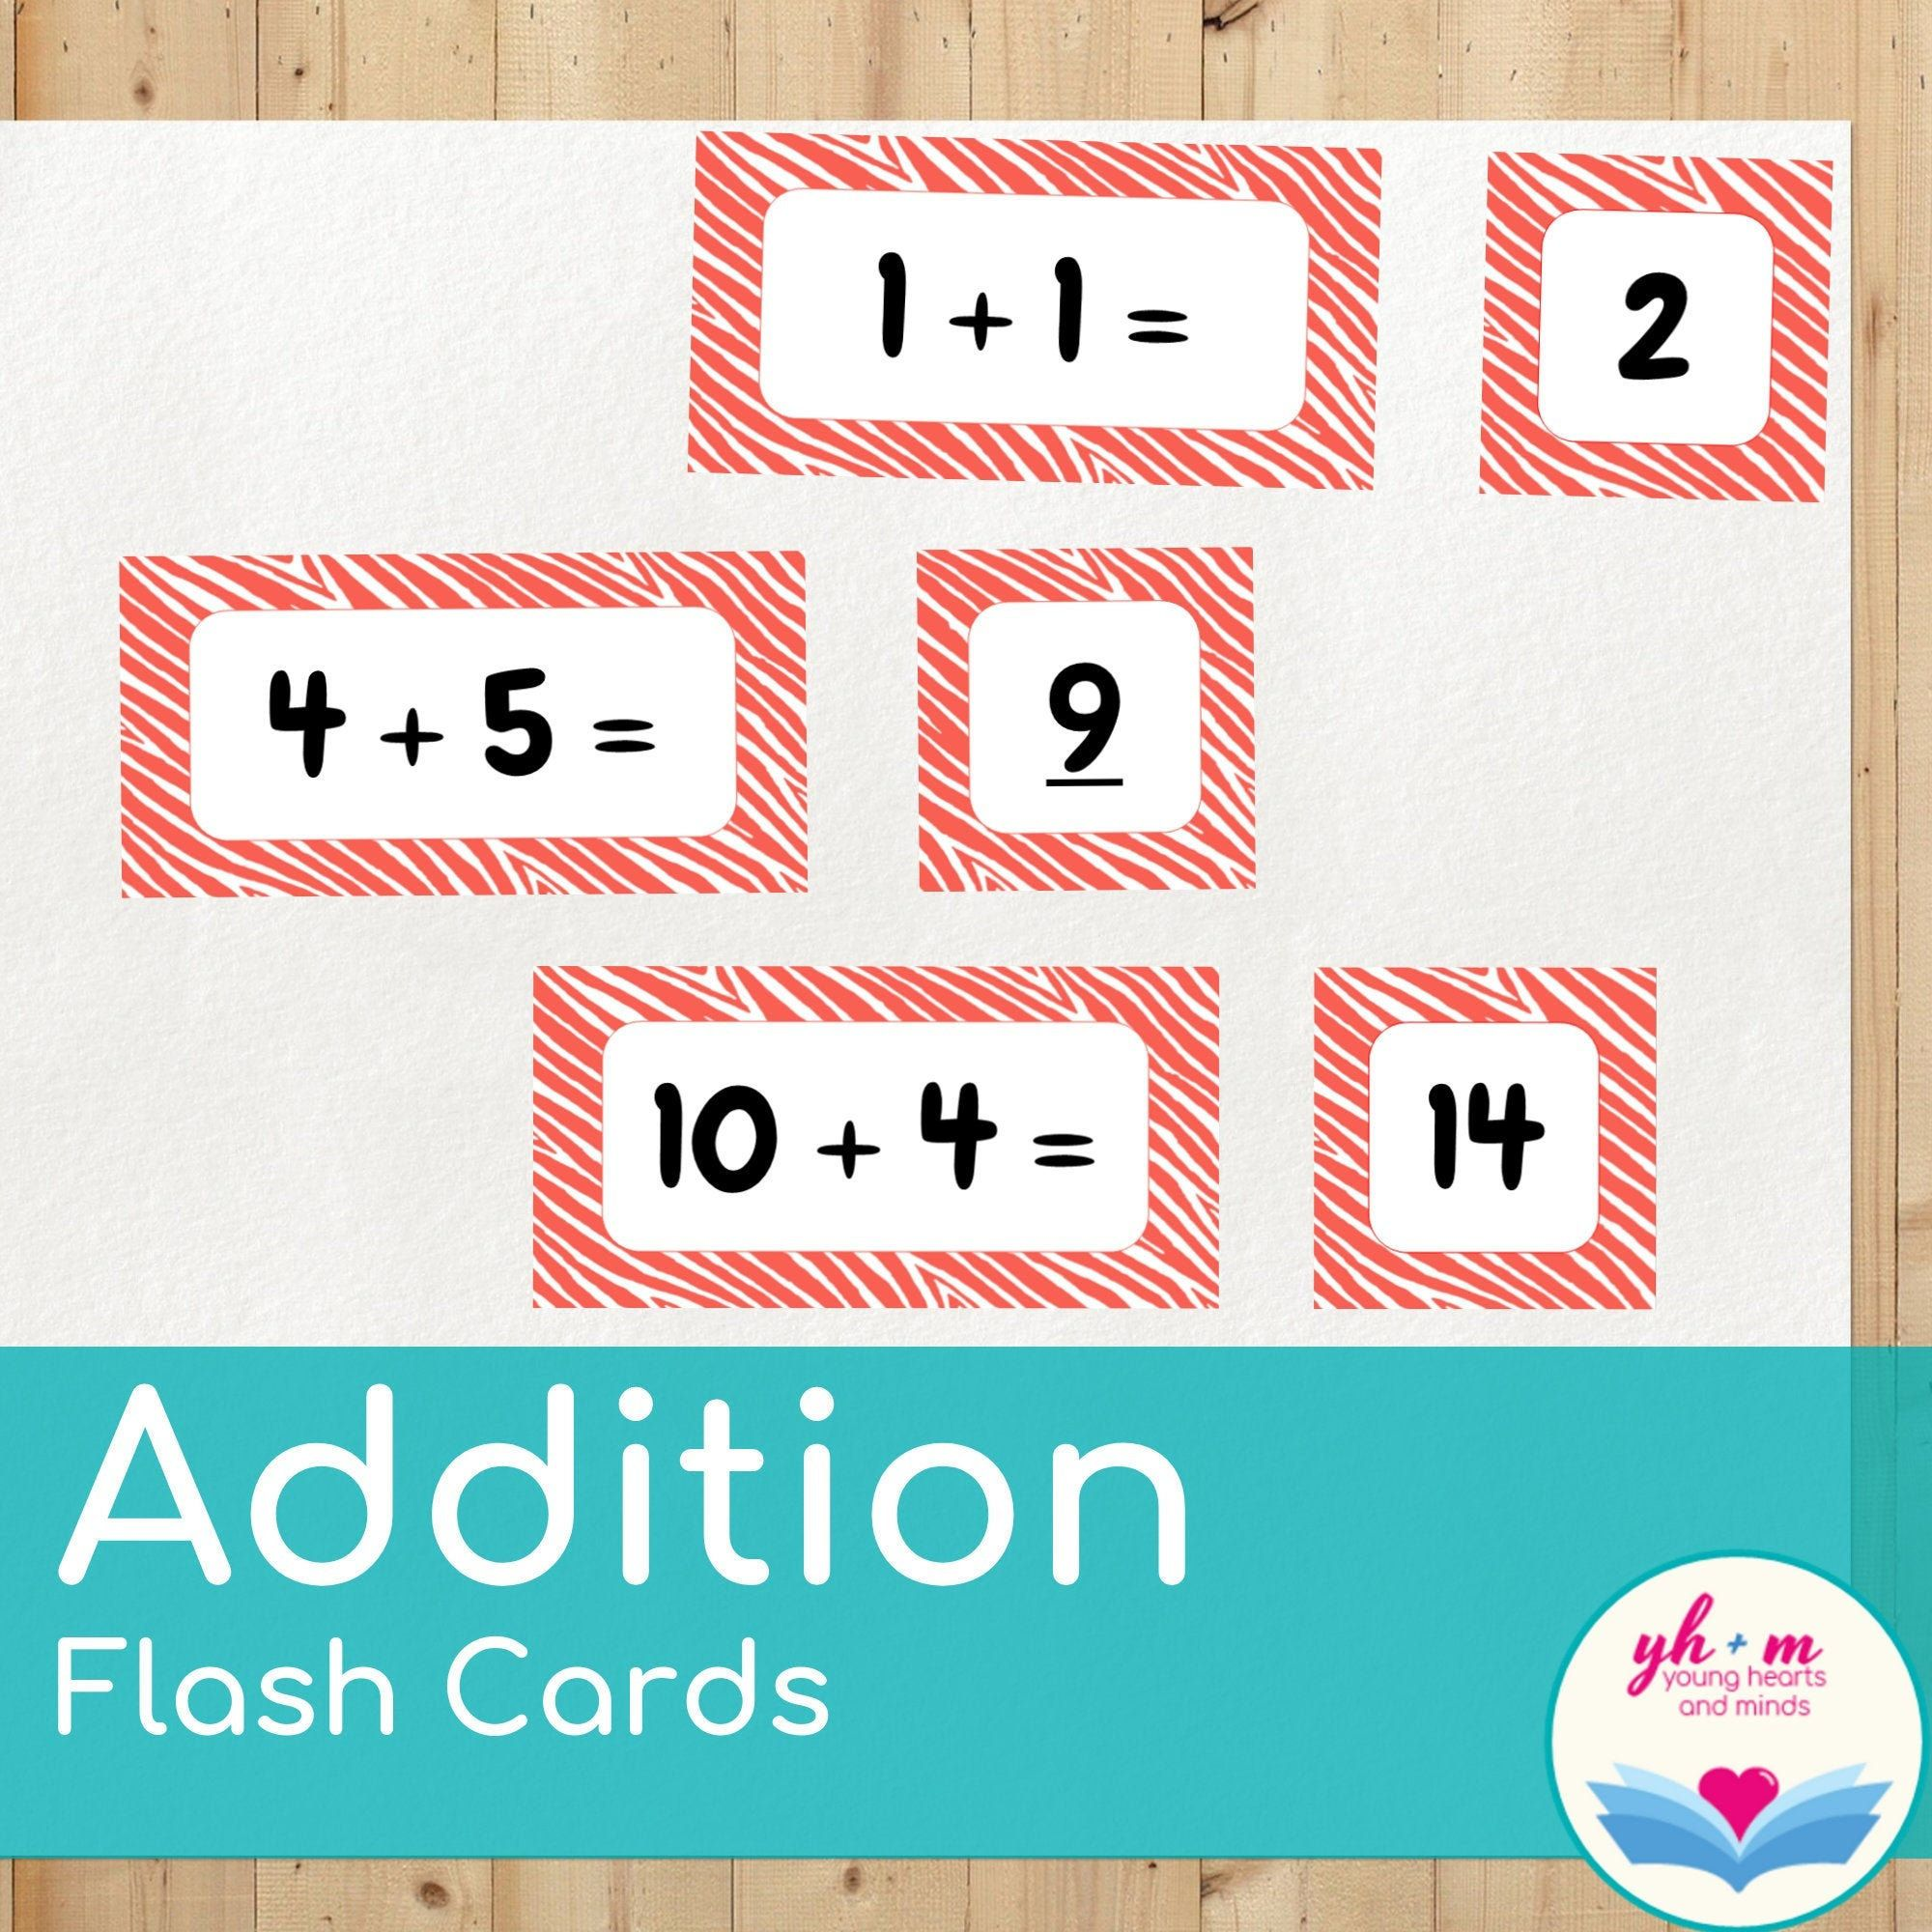 Addition Flash Cards Math Fact Practice Adding 0 10 For Etsy Addition Flashcards Kindergarten Flash Cards Math Fact Practice Addition math facts flashcards printable